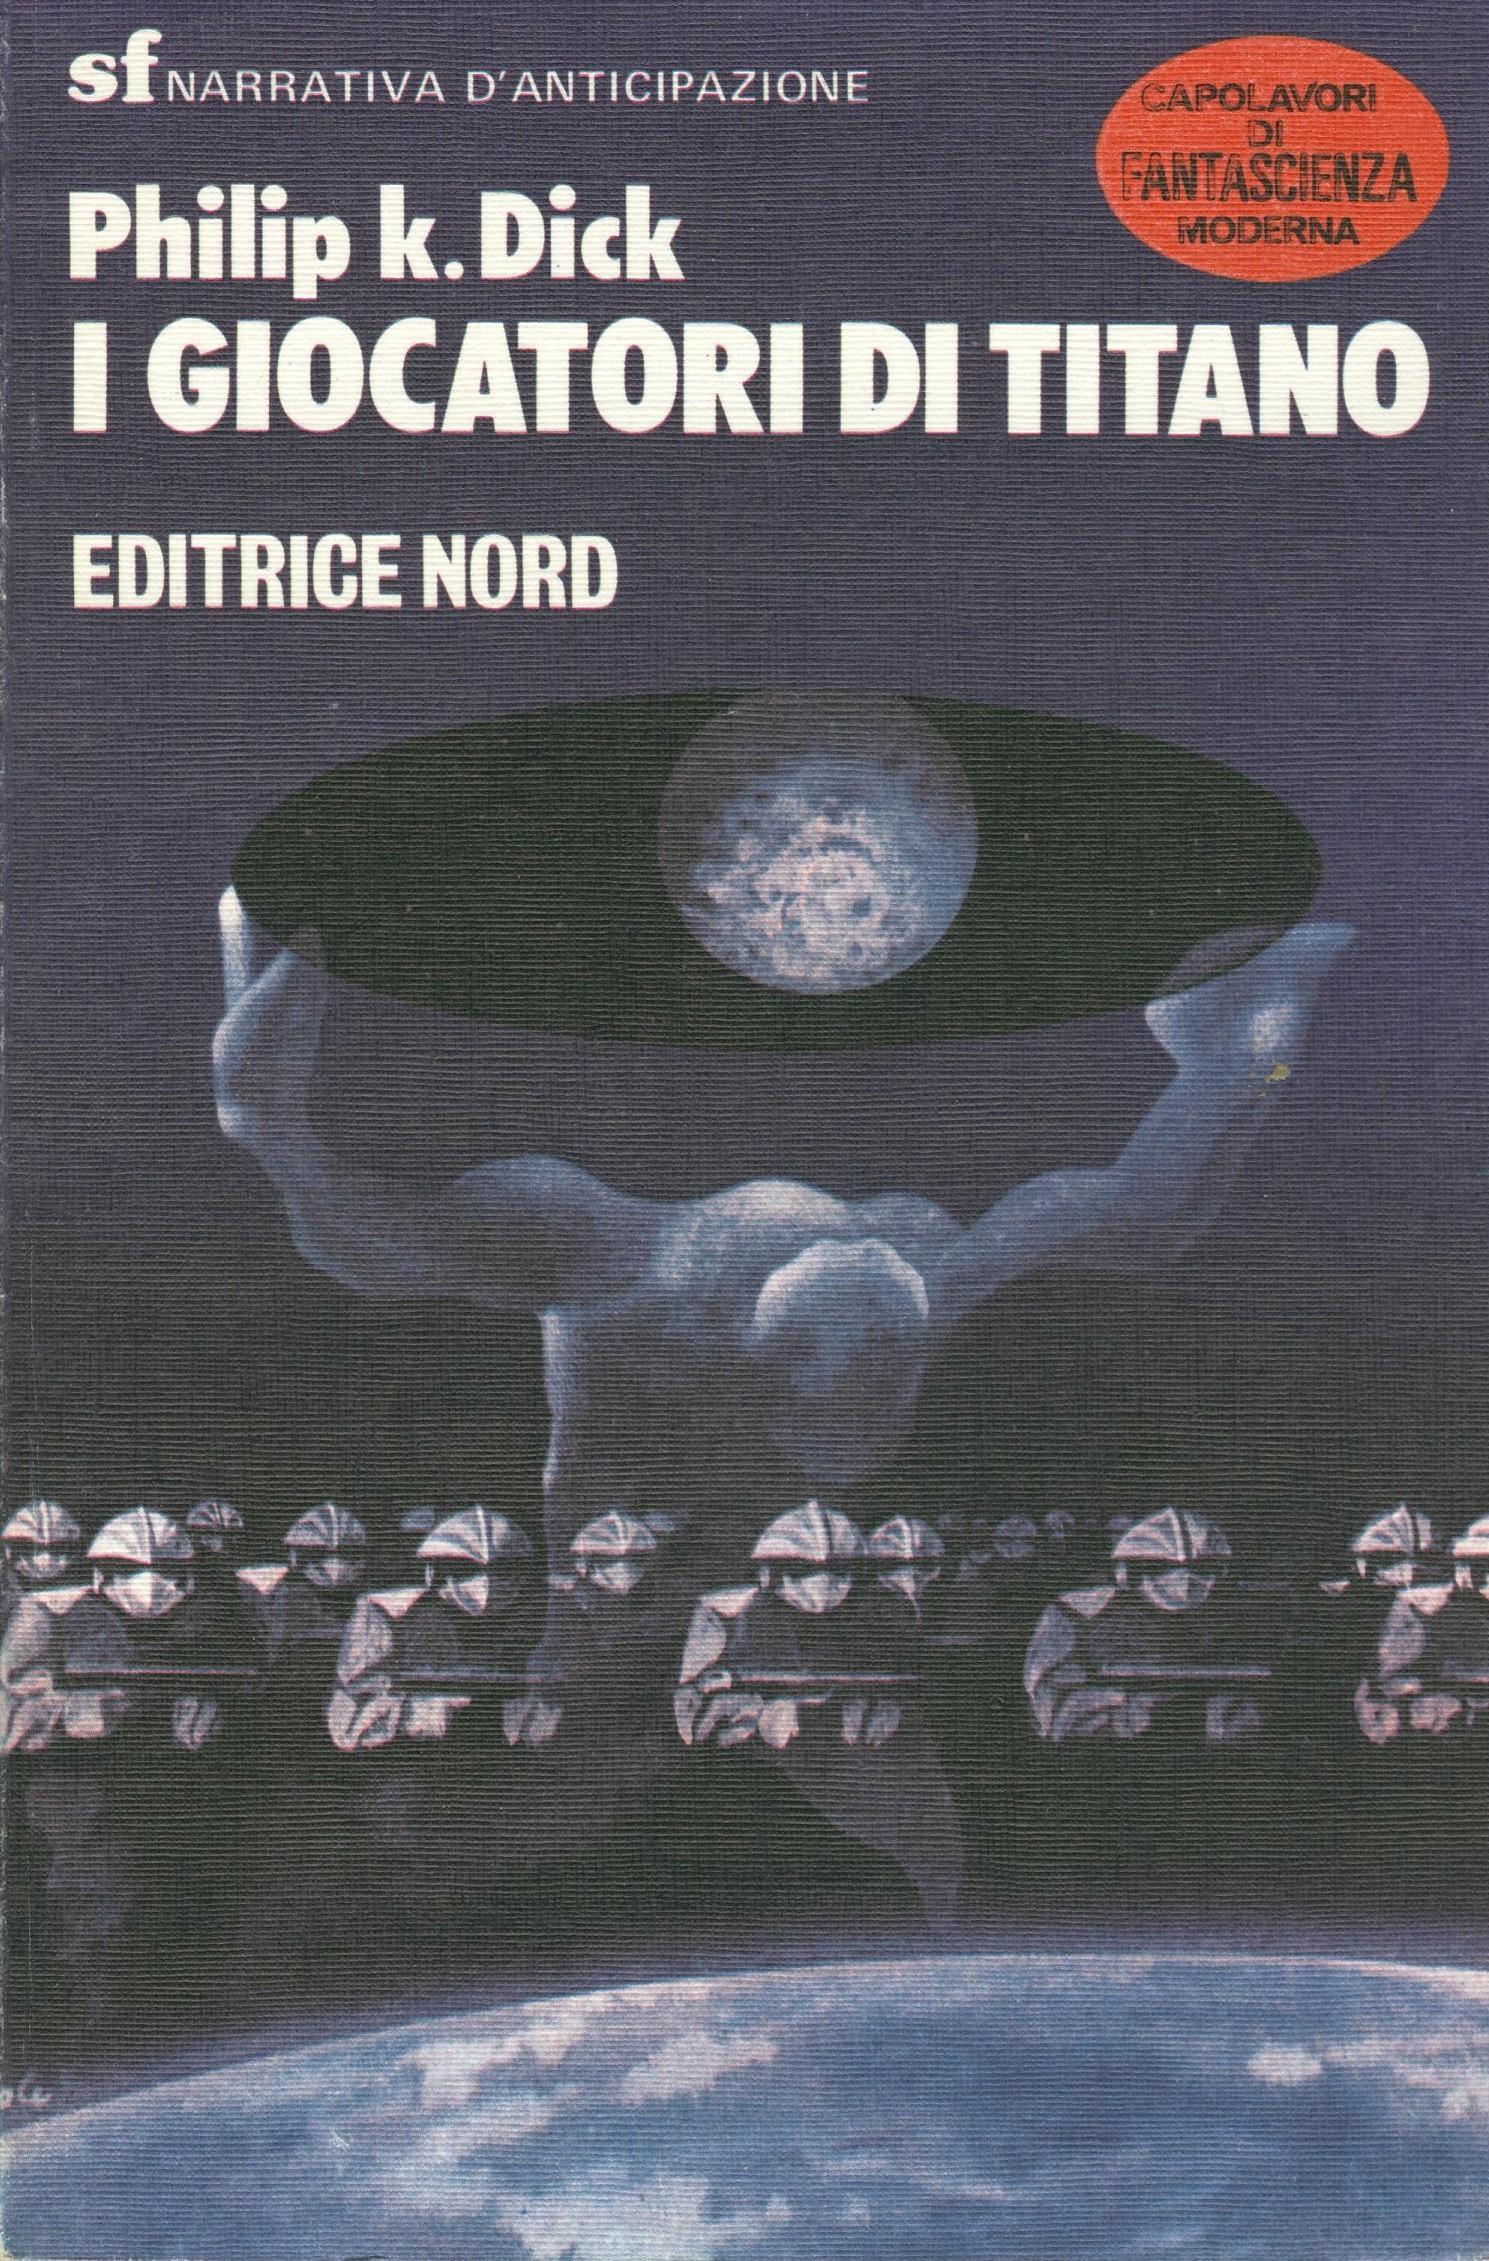 I giocatori di Titano - di Philip K. Dick 1 Iyezine.com